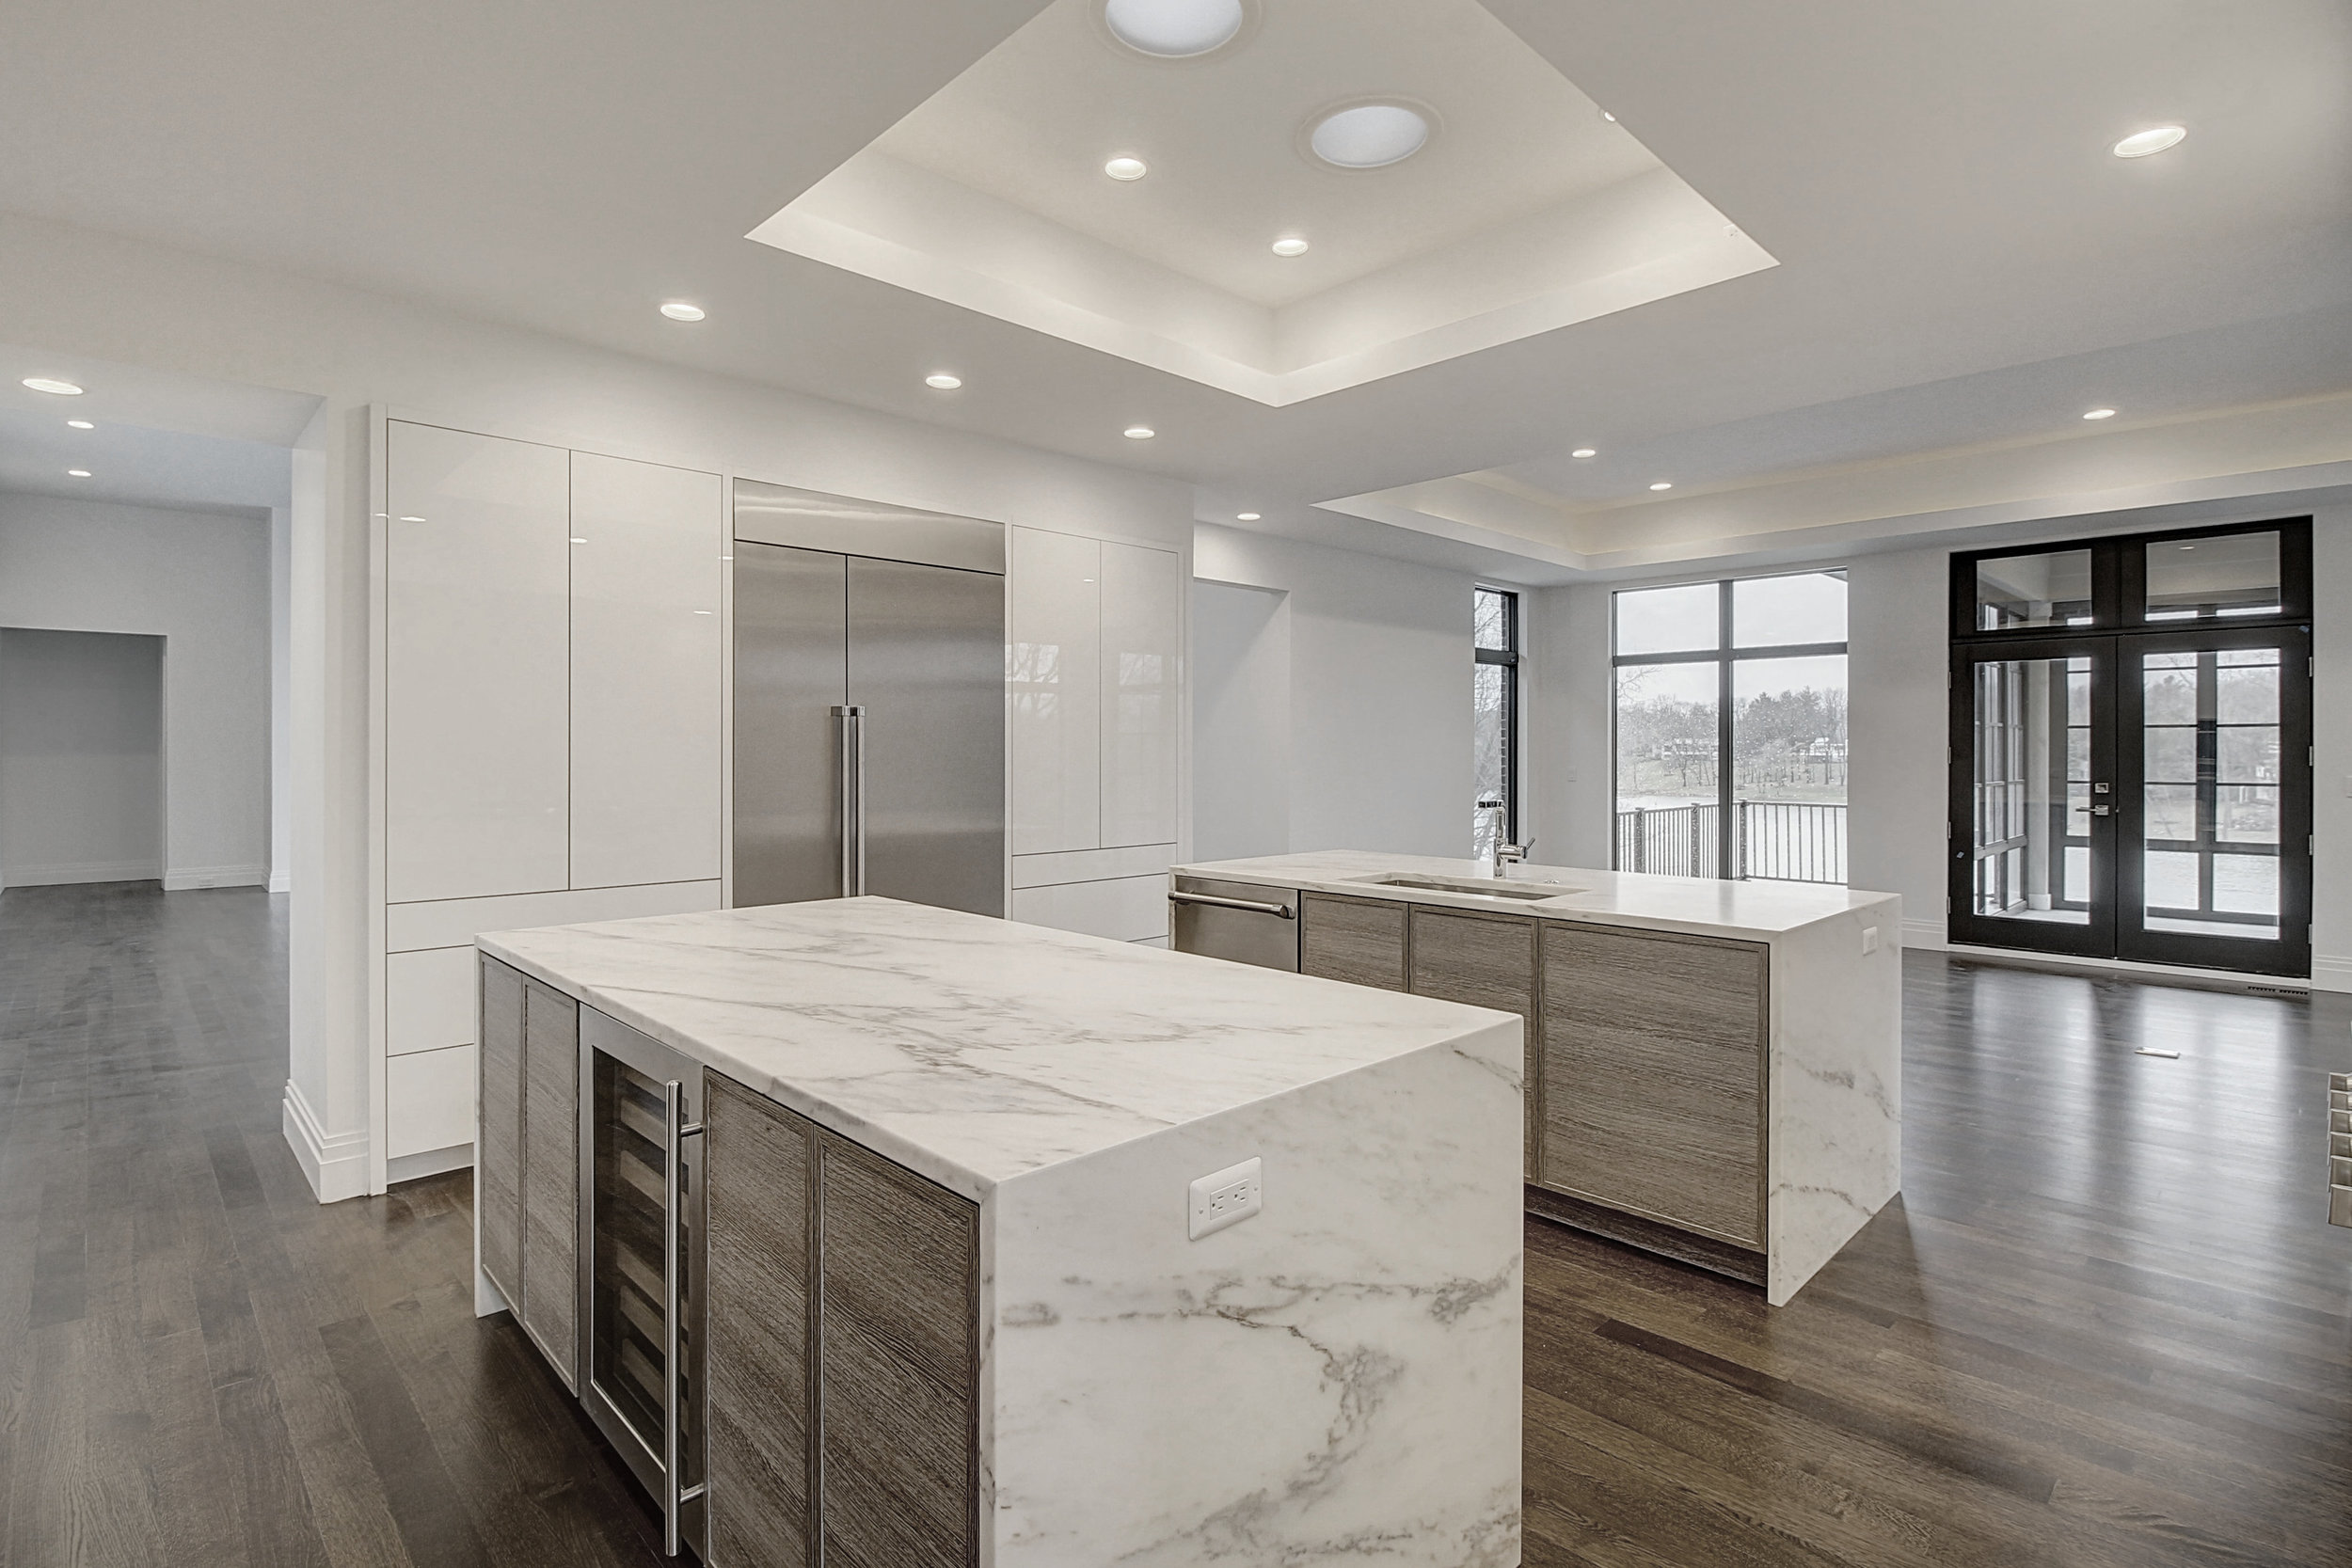 kitchengray3.jpg